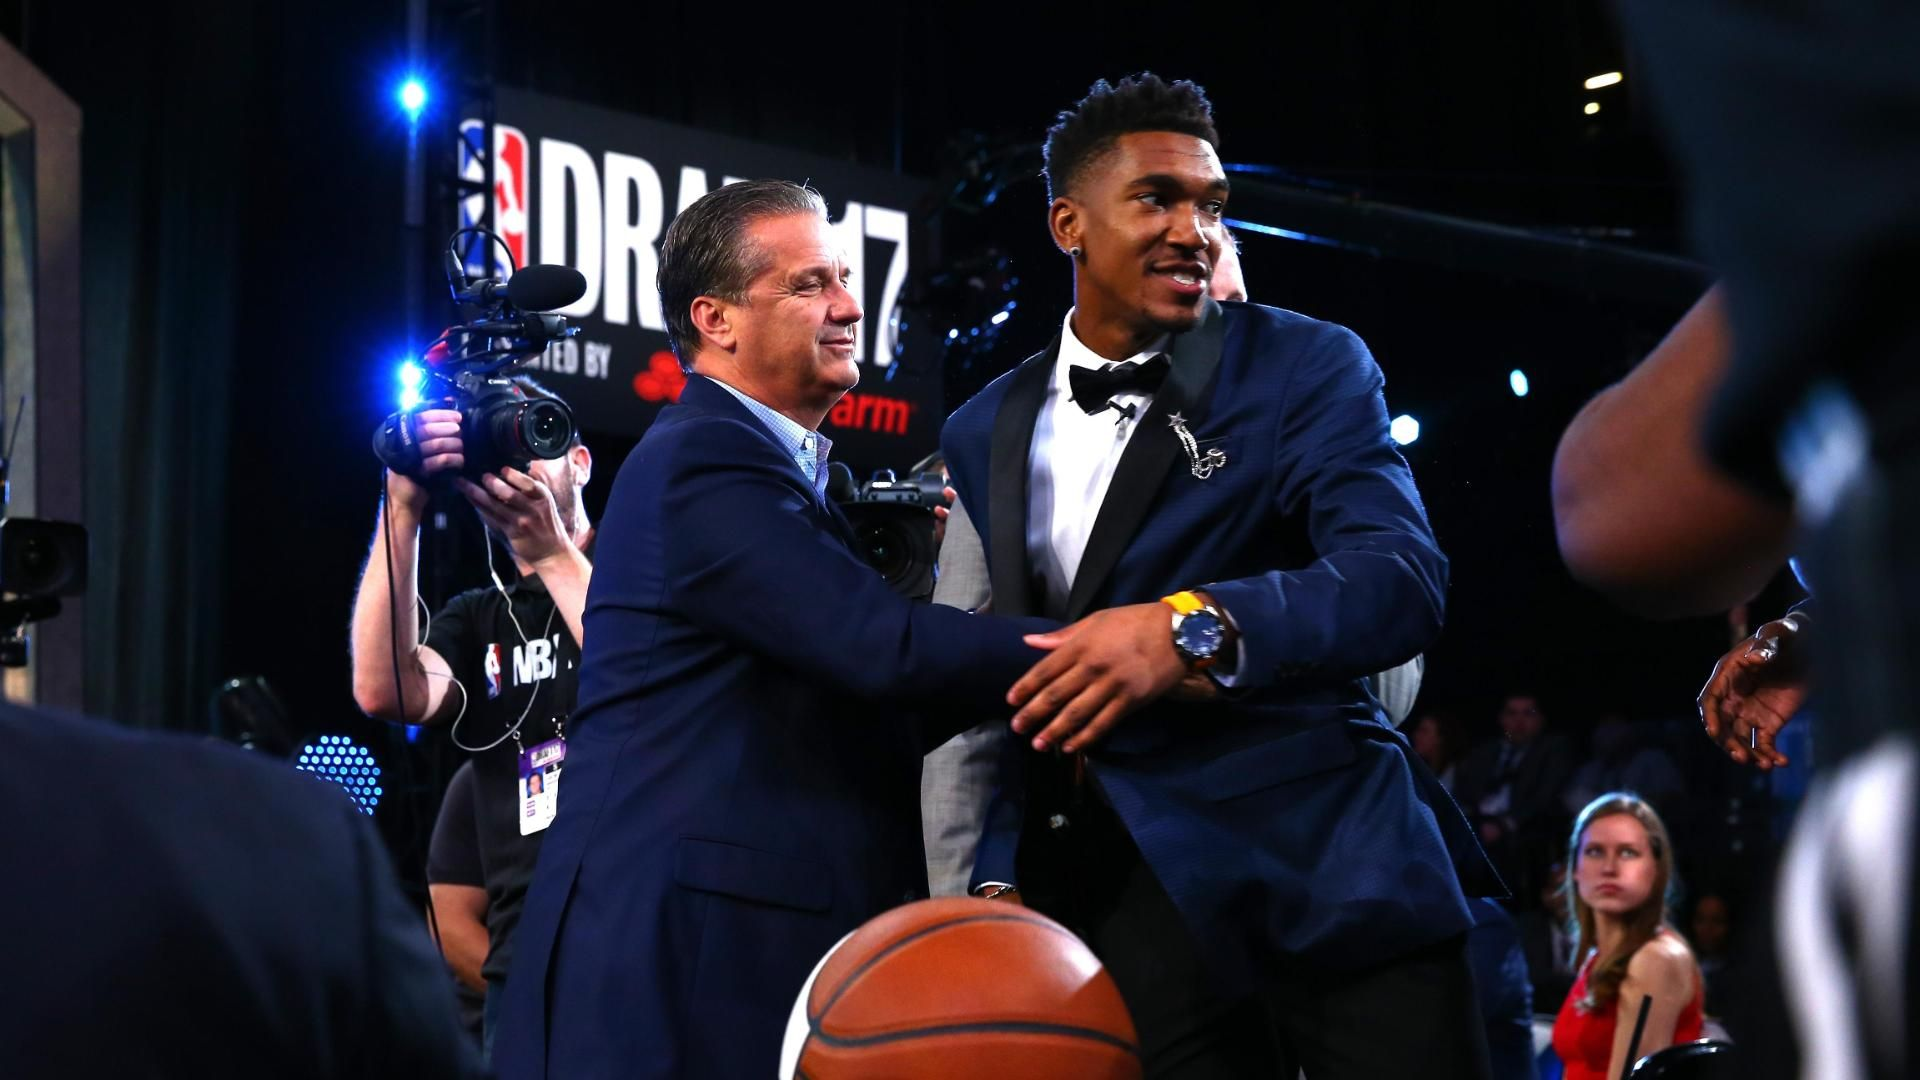 Kentucky has taken over the NBA draft lottery